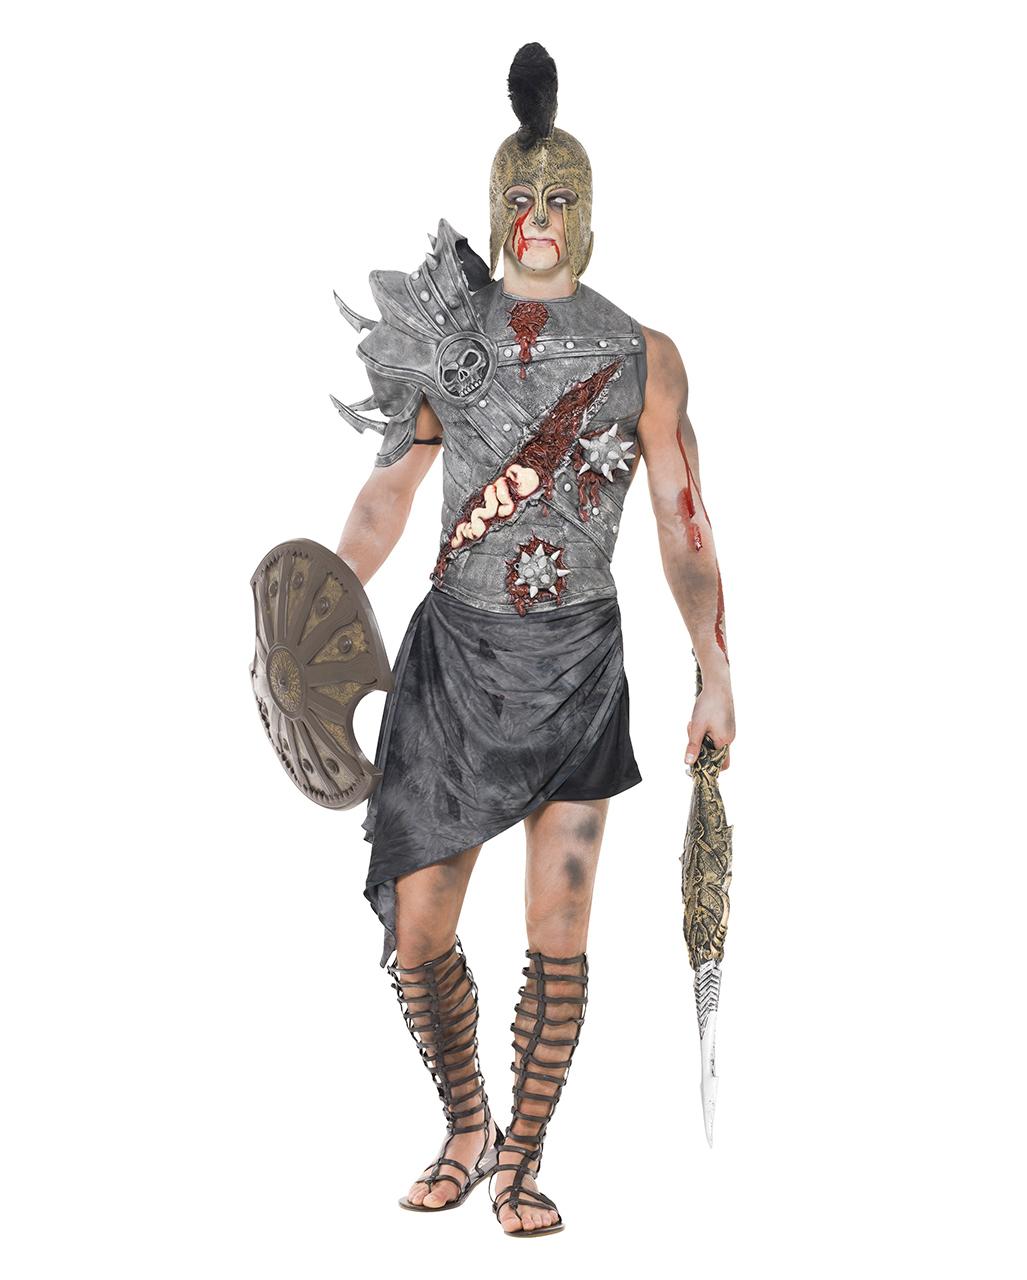 Zombie Gladiator Premium Costume Zombie Costume Karneval Universe